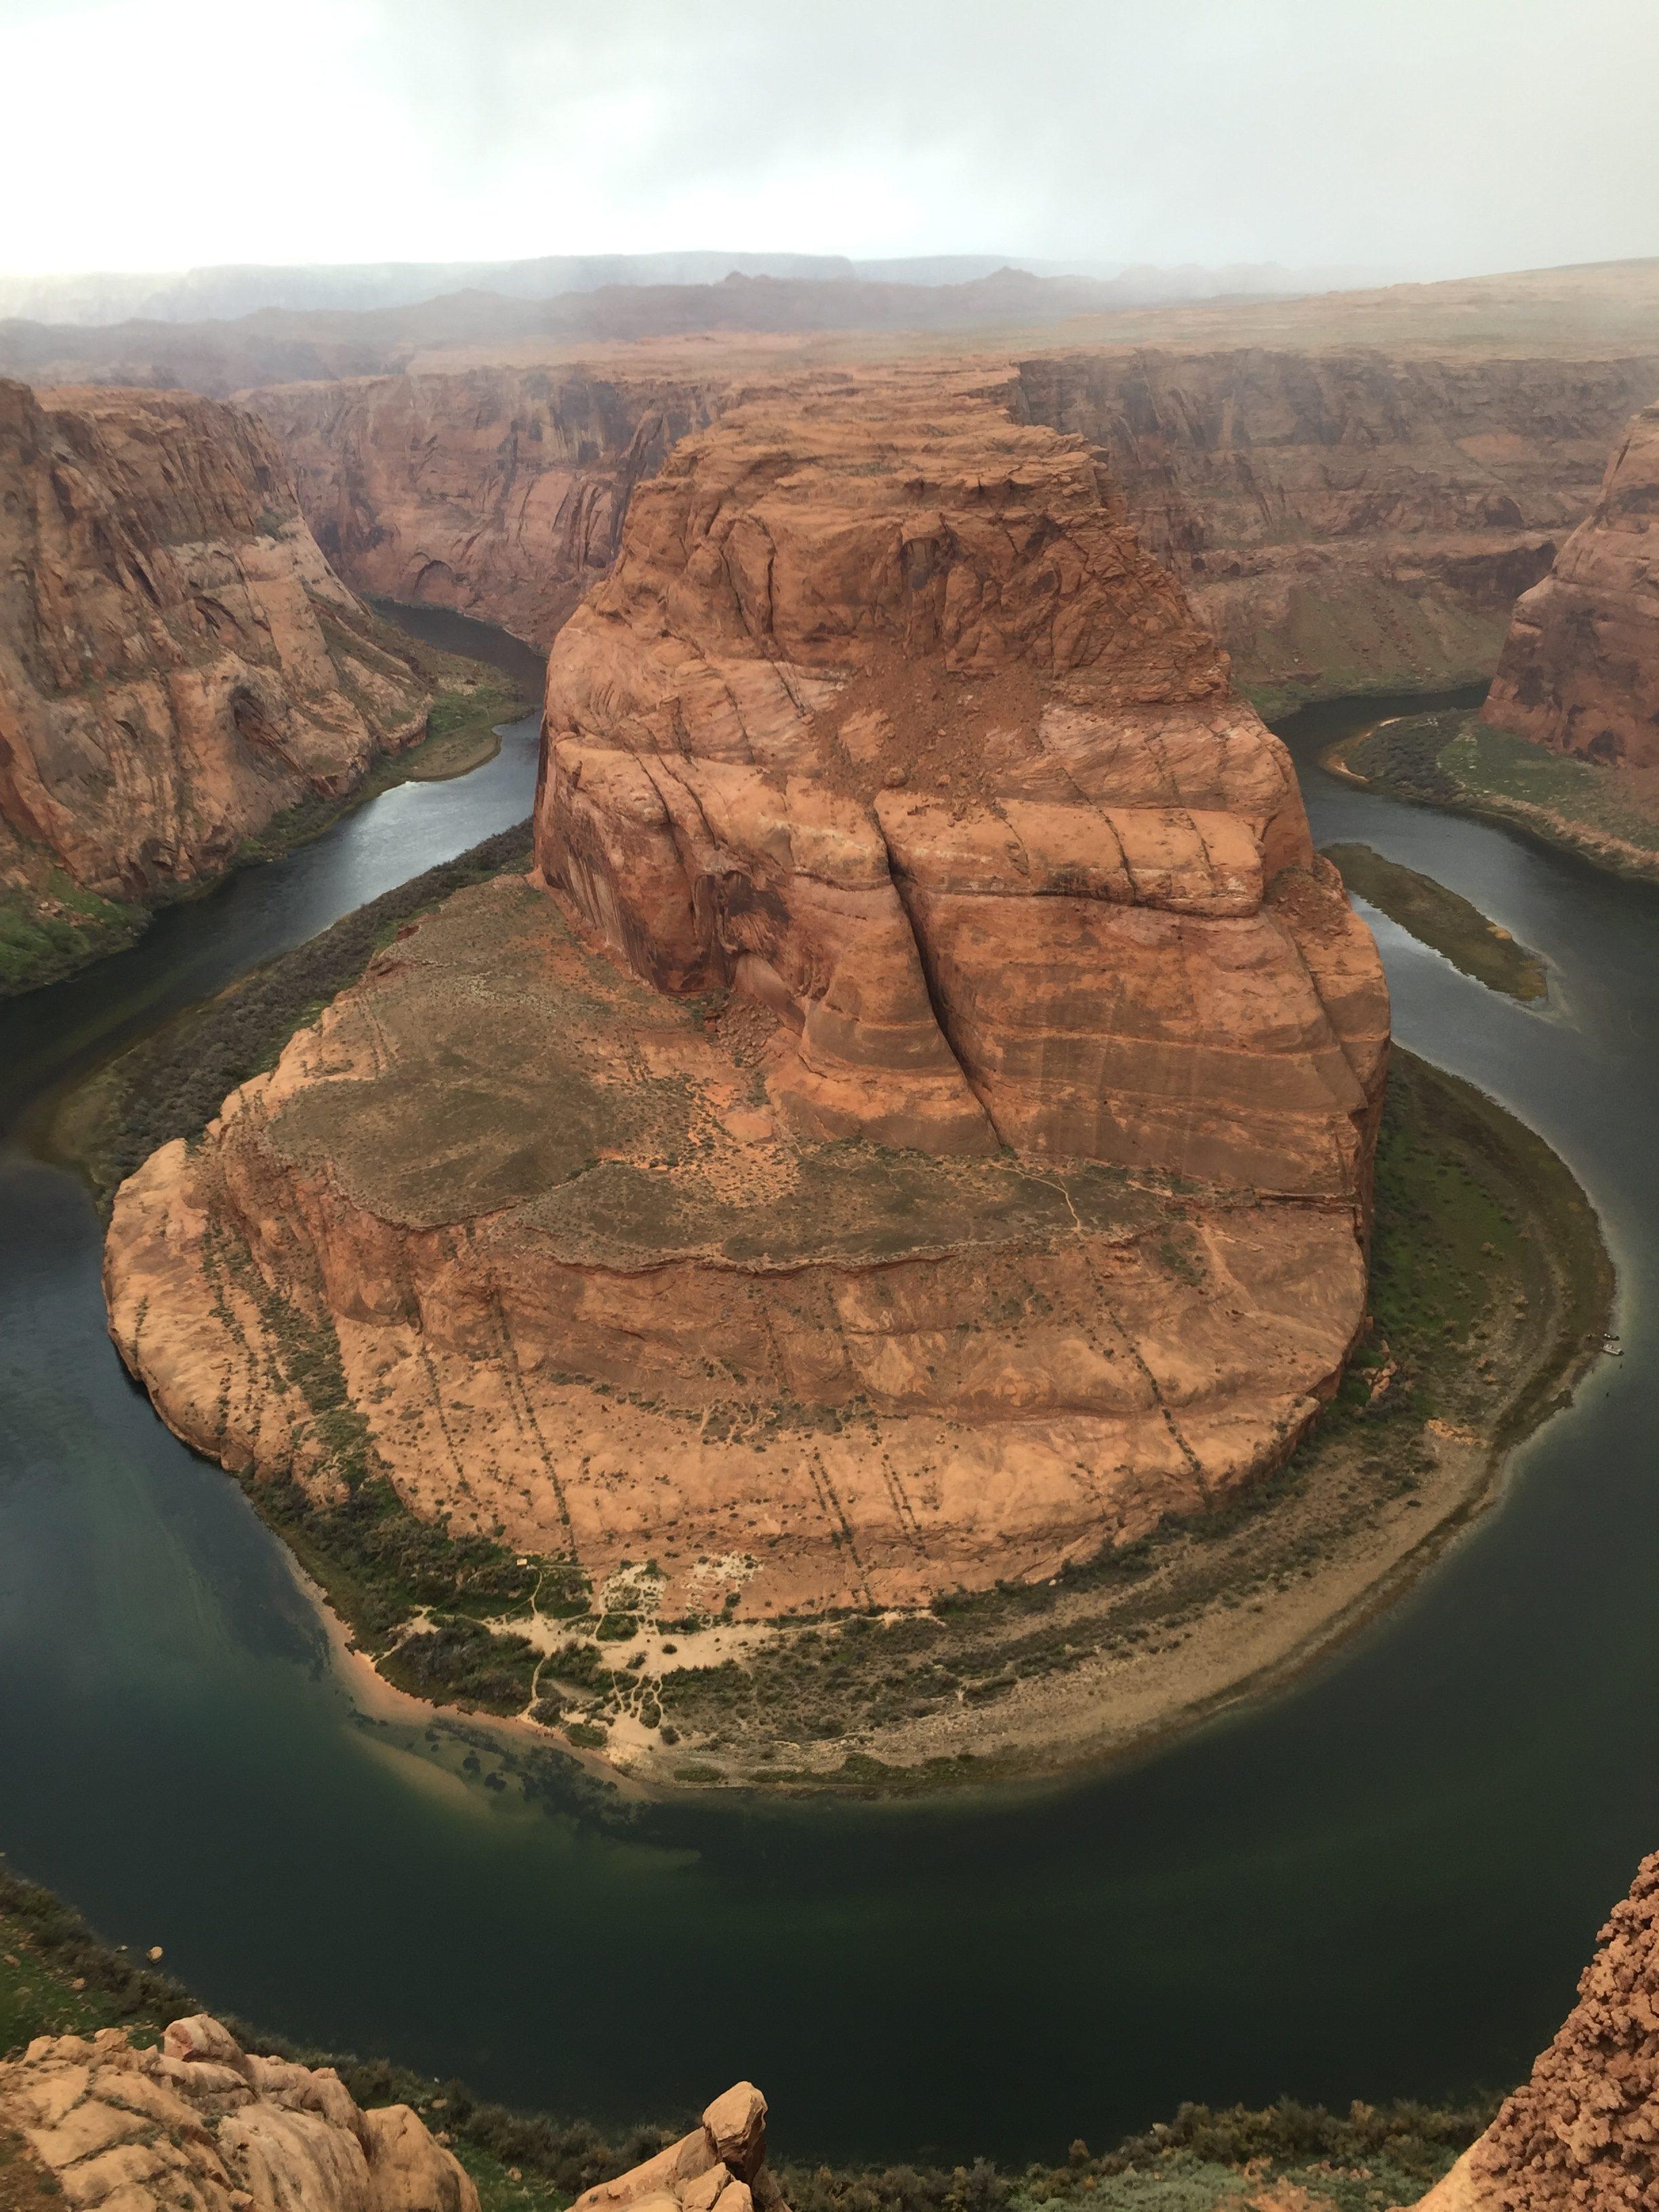 Horseshoe Bend south of Page, Arizona, Nov. 27, 2015| photo courtesy of Carolyn Barton, St. George News